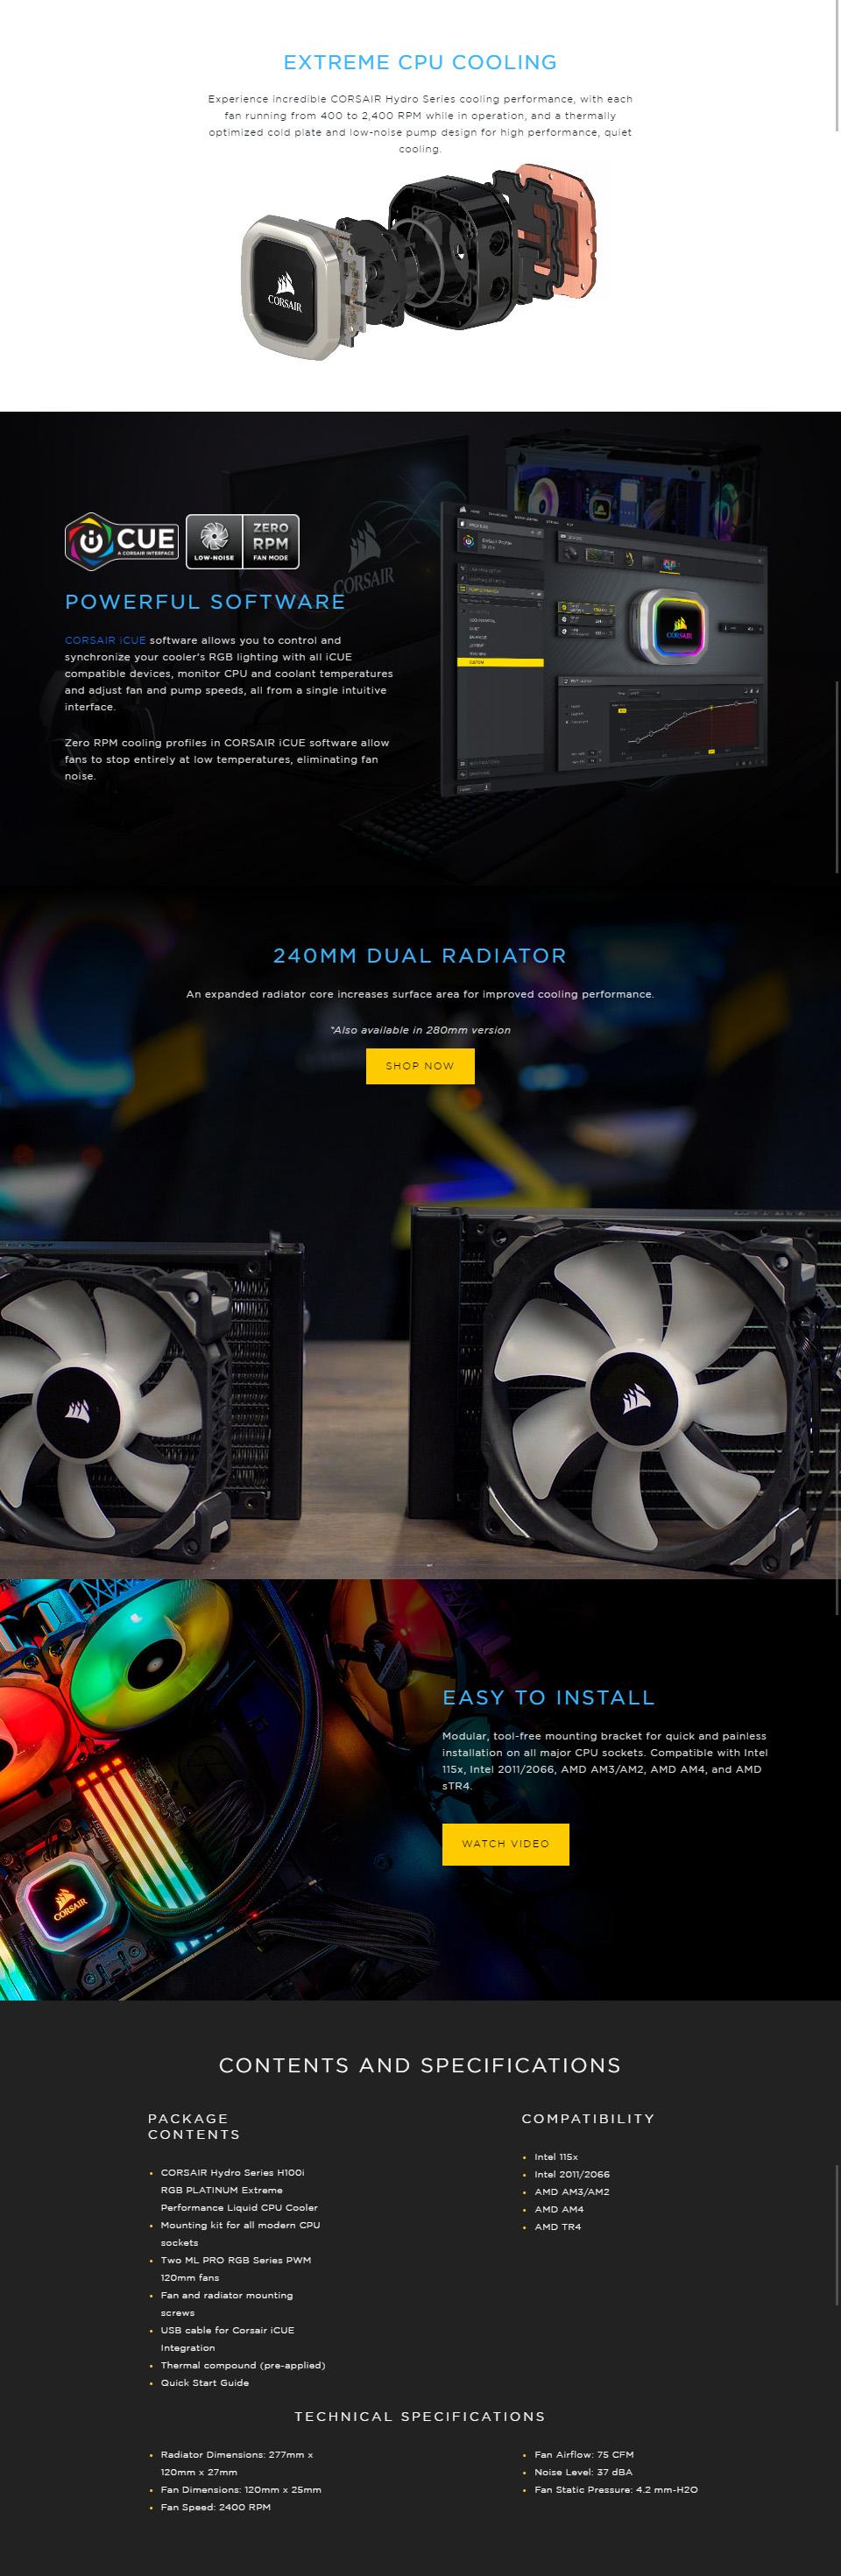 CORSAIR Hydro Series H100i RGB PLATINUM Extreme Performance 240mm Liquid  CPU Cooler